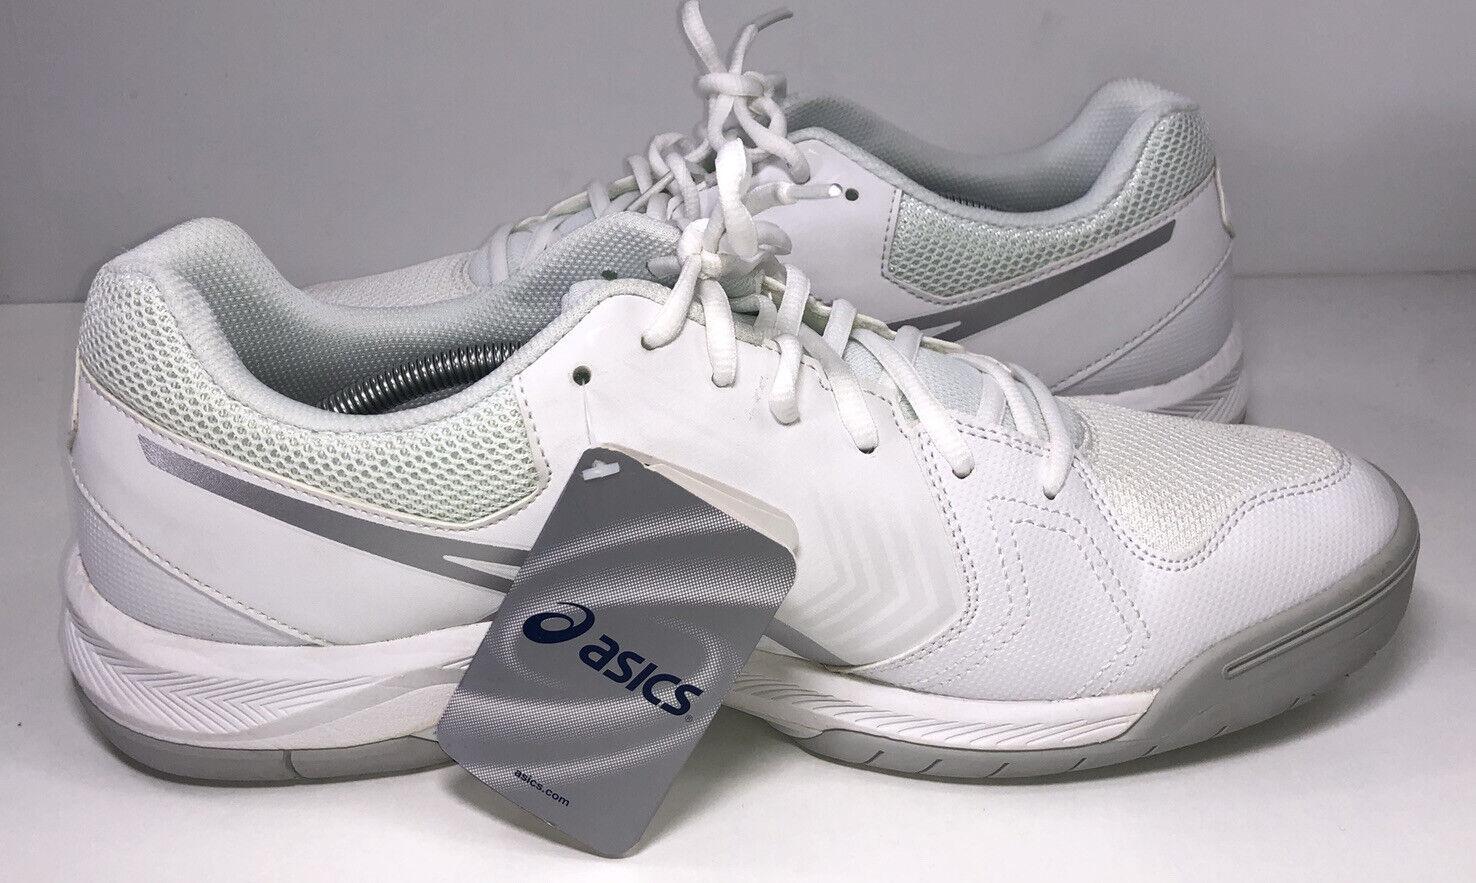 Mens ASICS GEL Dedicate Tennis Court Shoes Size 10 White Silver Gray E707Y